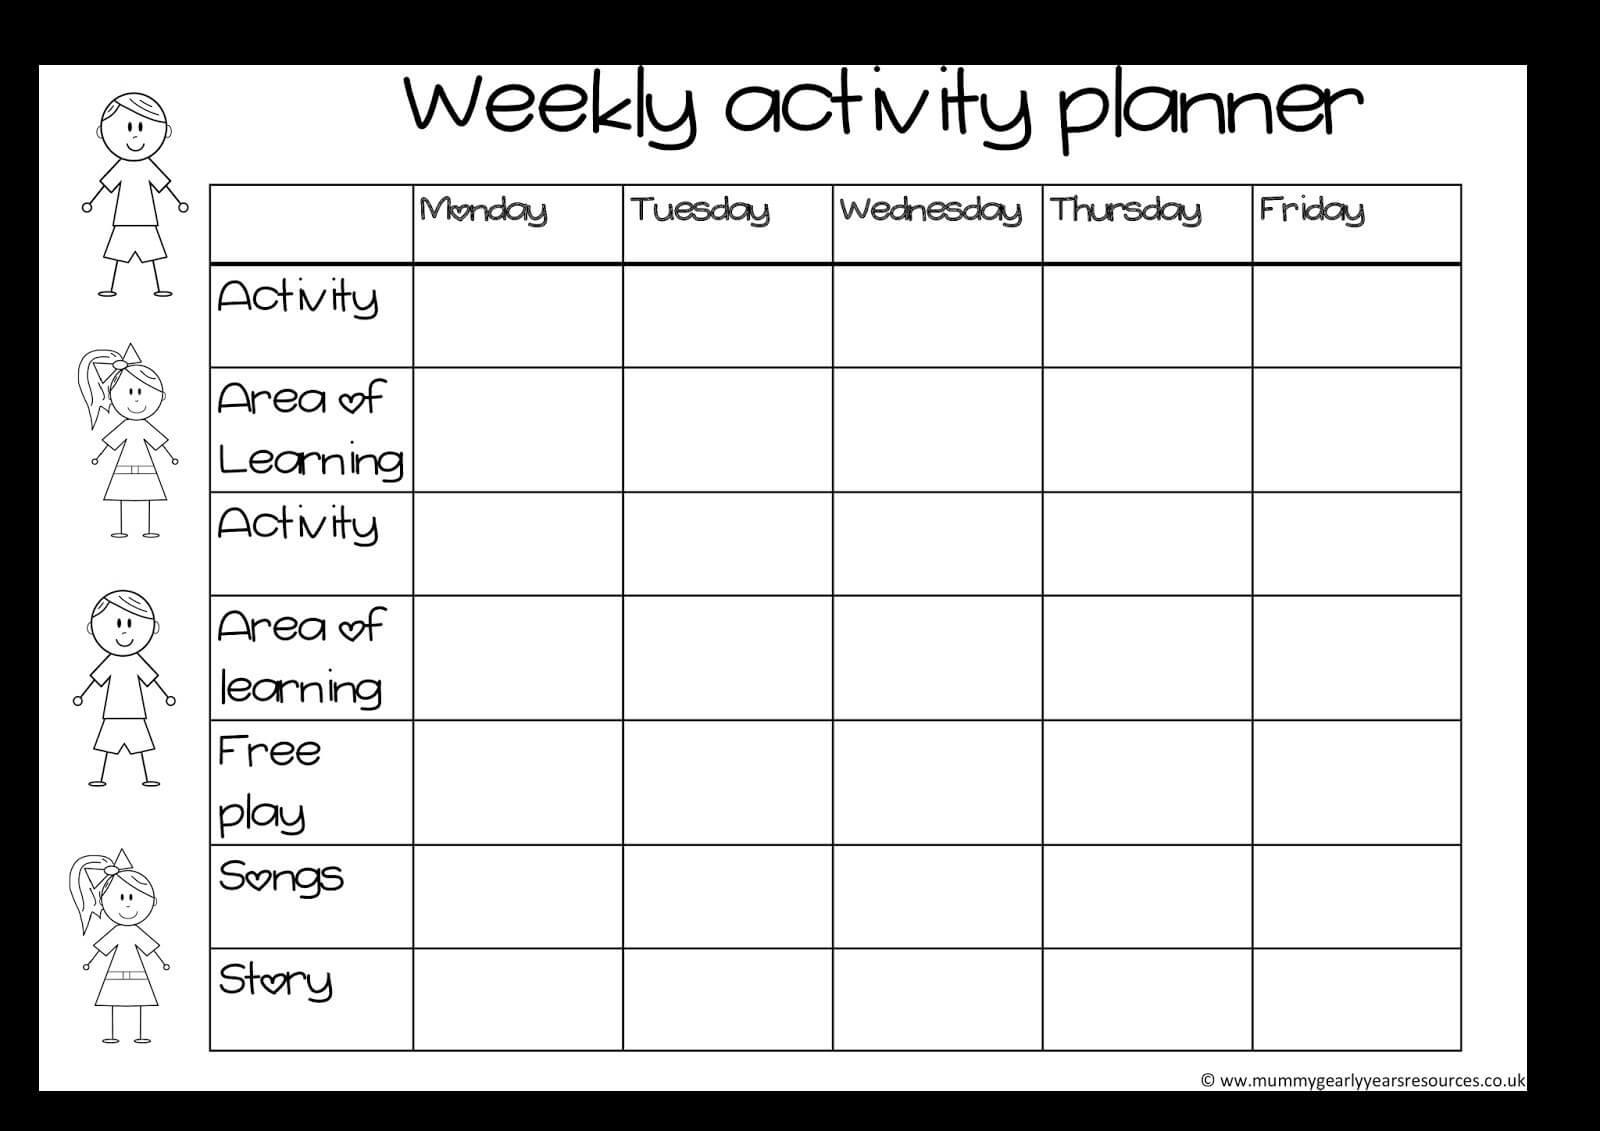 Blank Activity Calendar Template 28 Templates Also With In Blank Activity Calendar Template